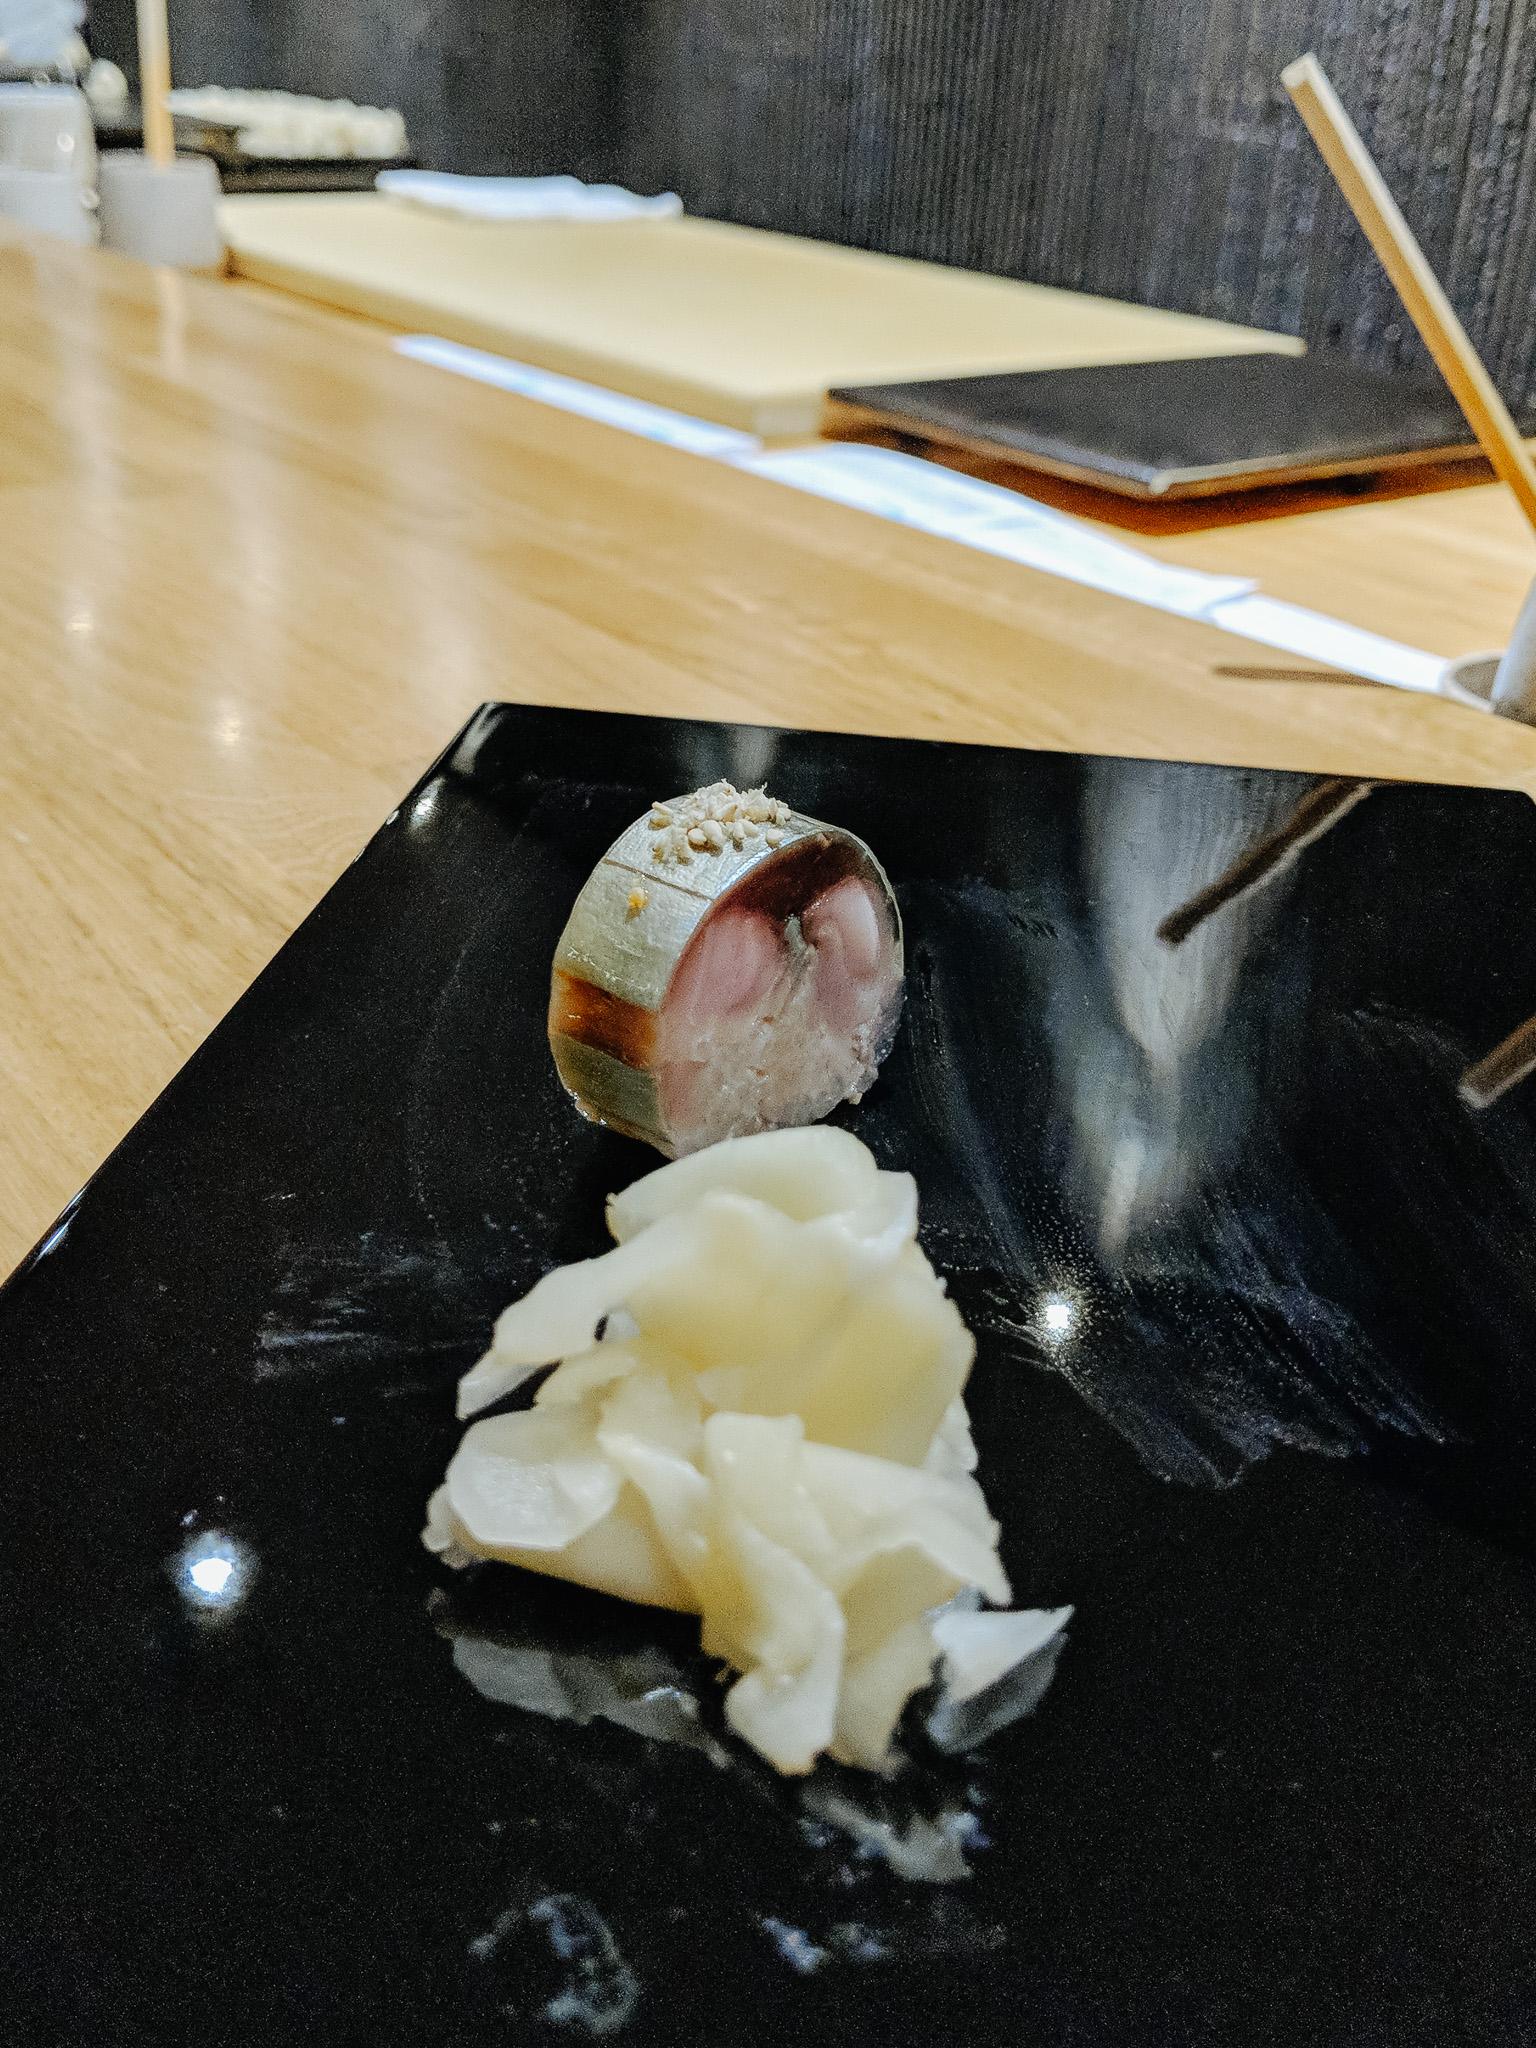 minamishima-melbourne-food-photographer-016.JPG